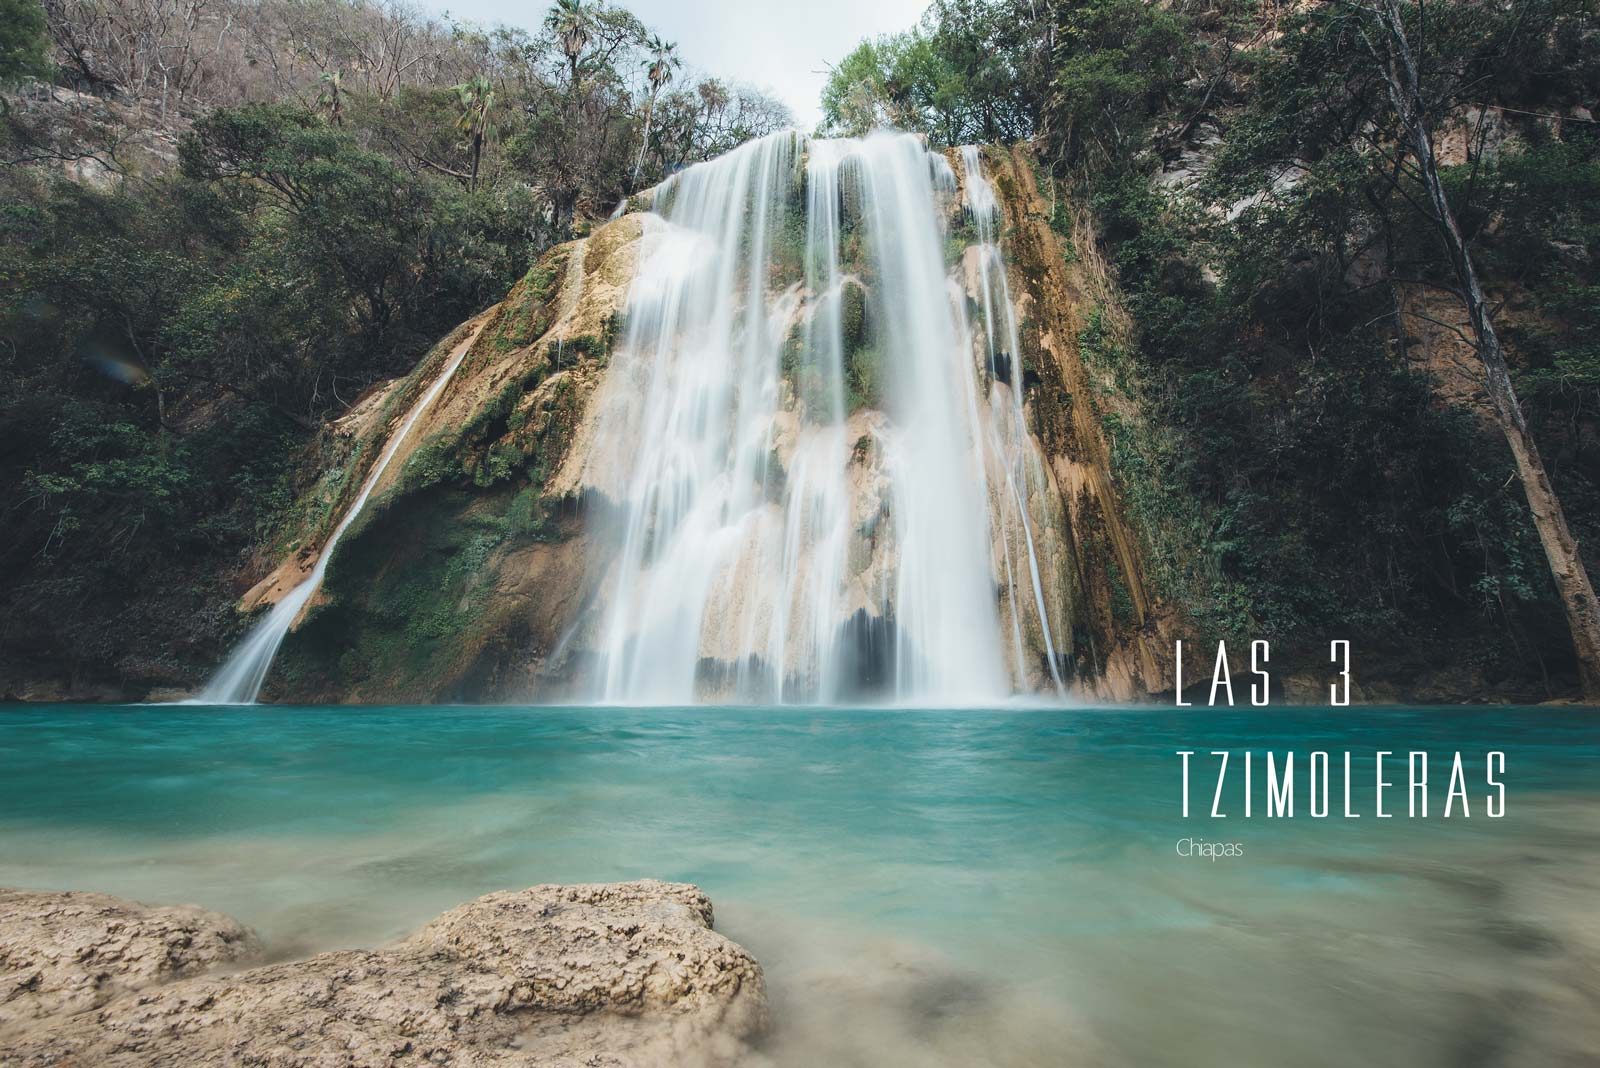 Cascades Las 3 Tzimorelas, Chiapas, Mexique